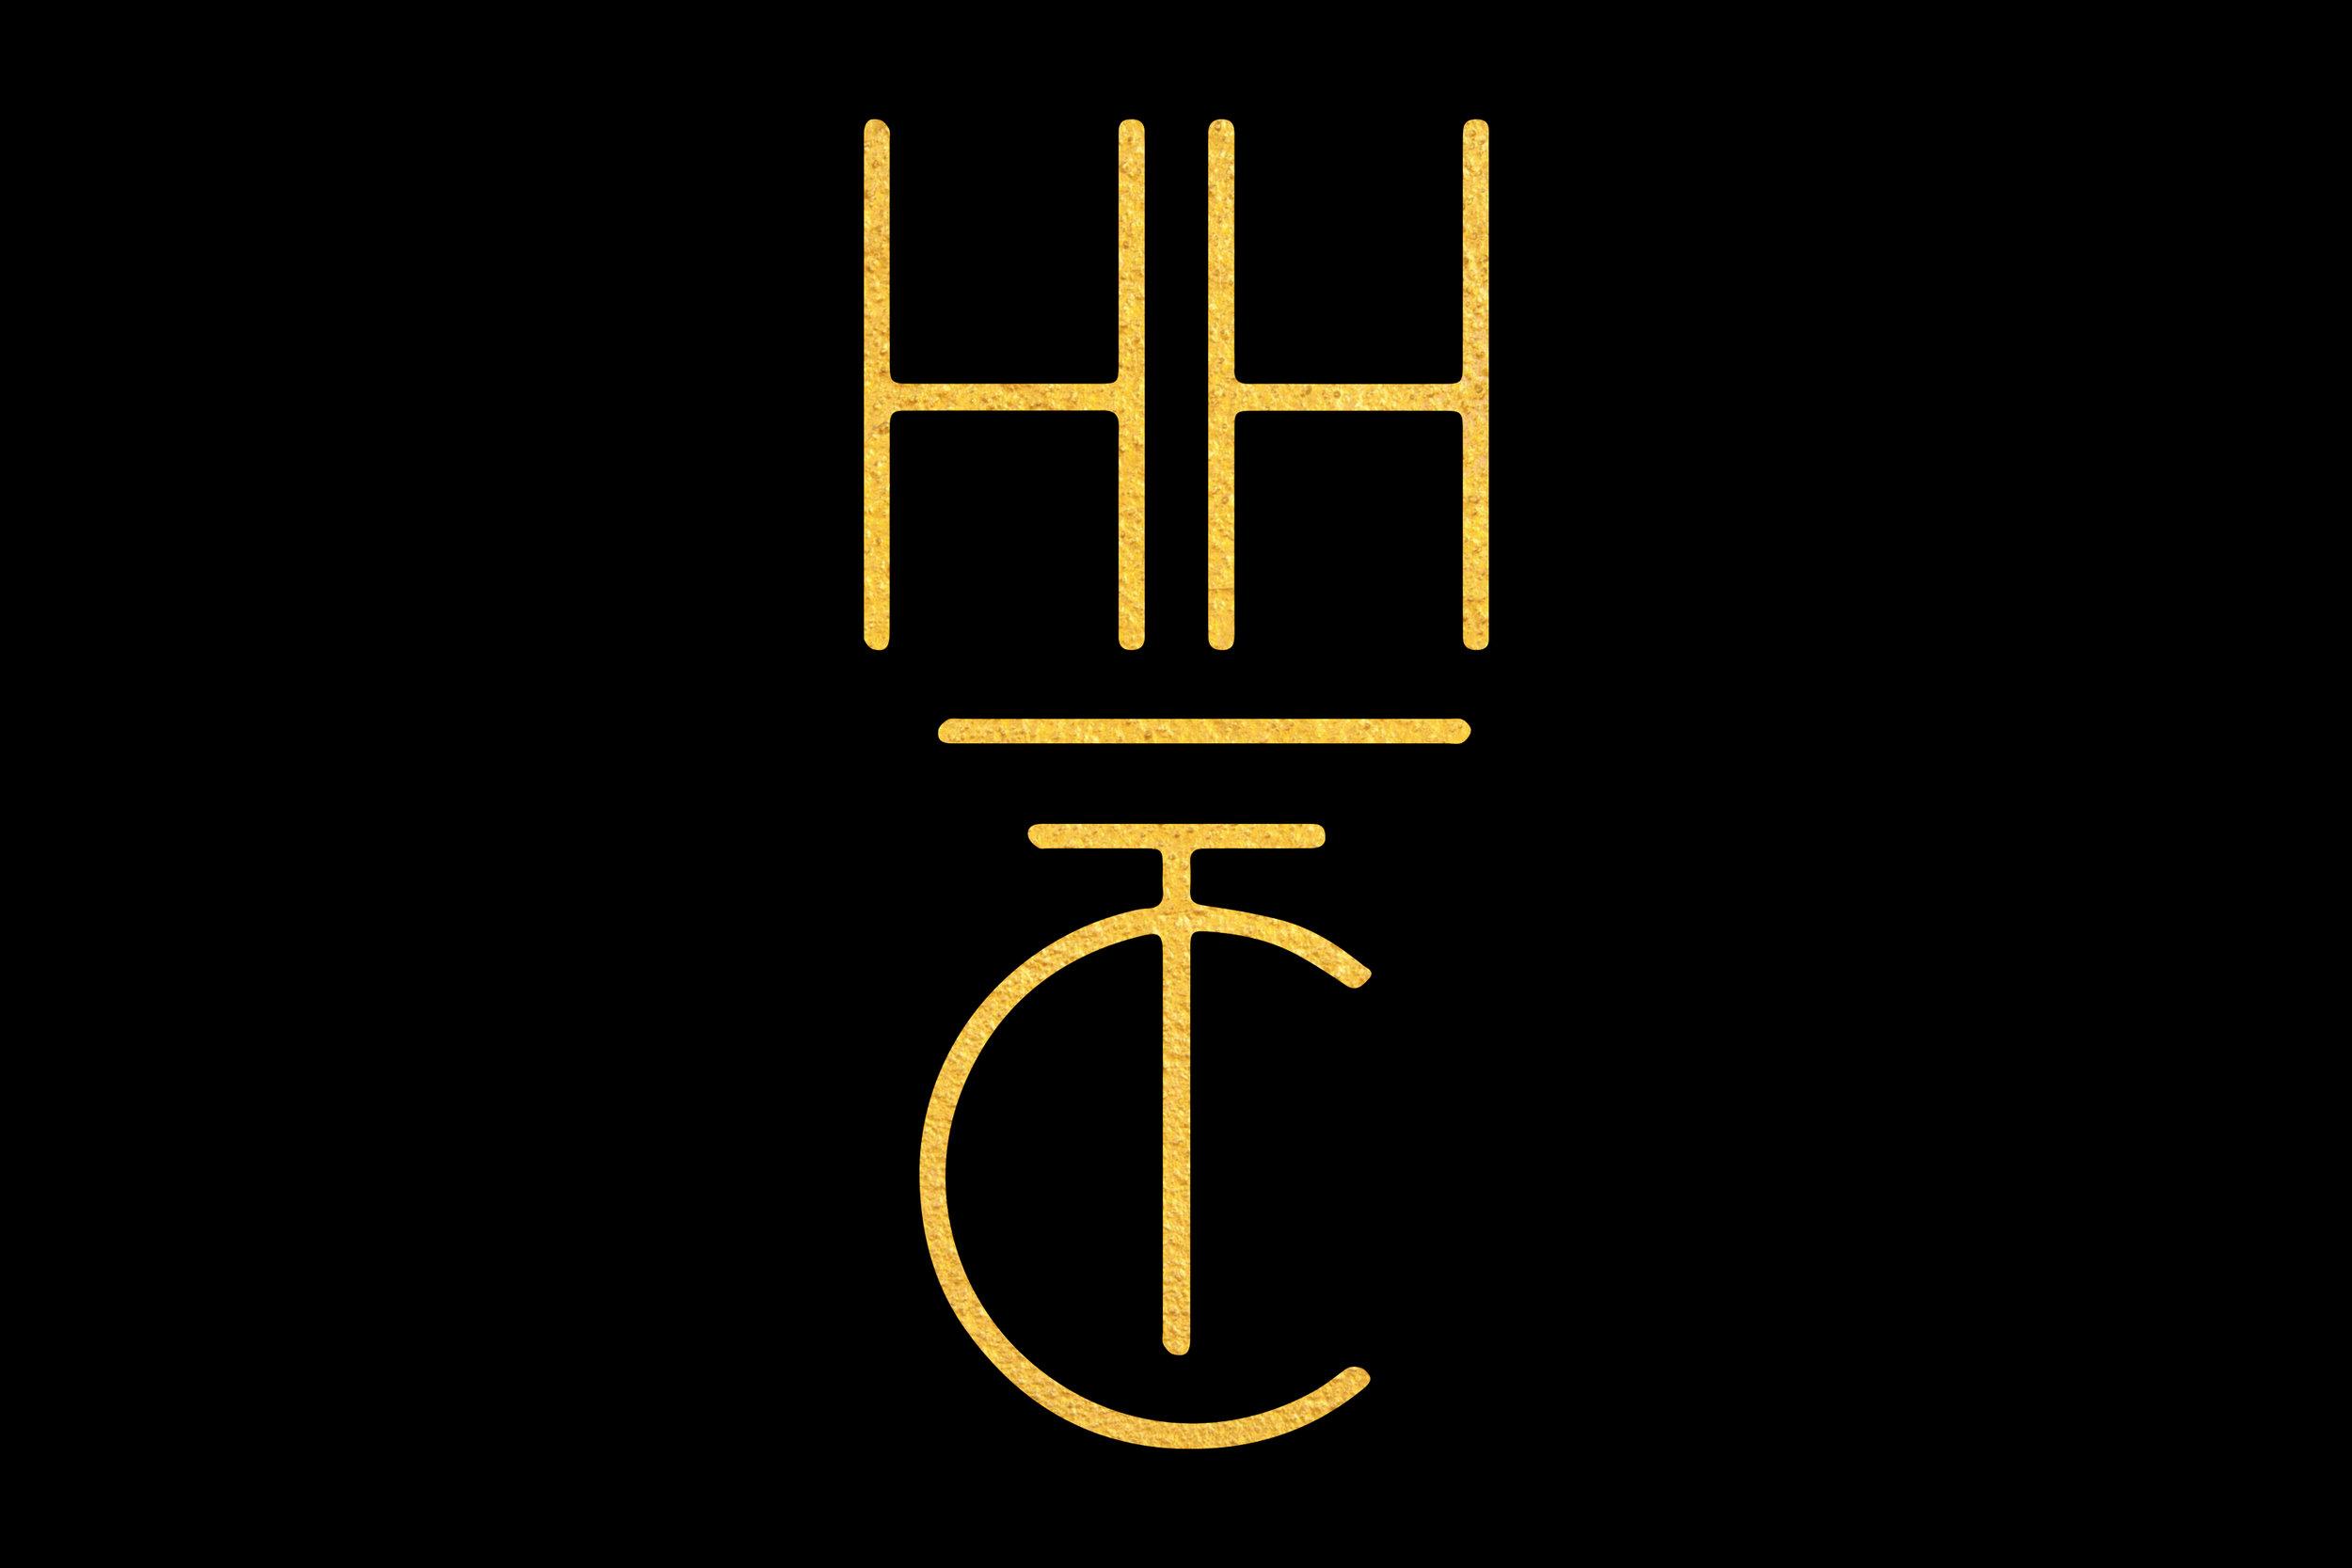 HHTC SYMBOL 2.jpg